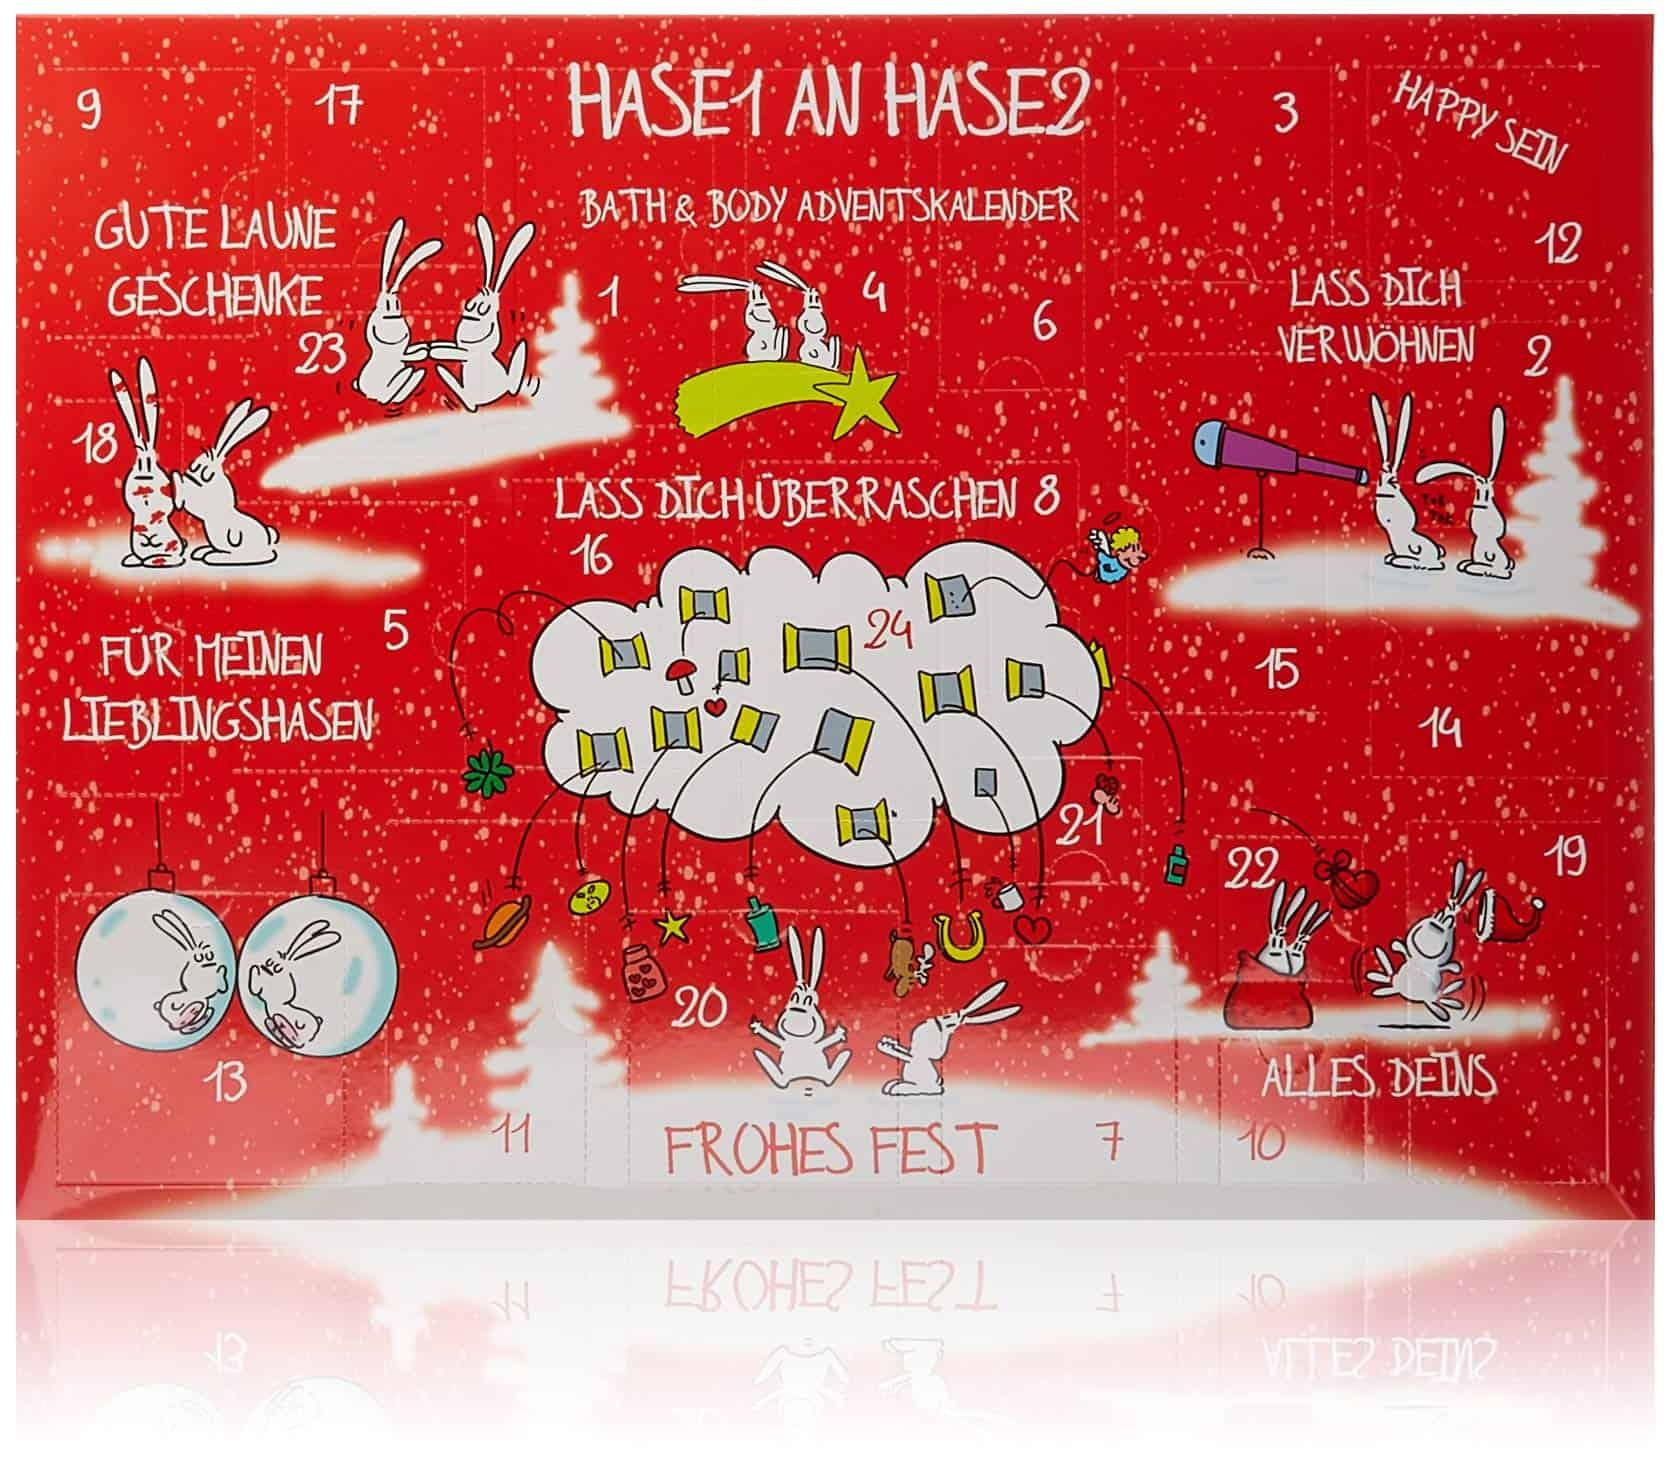 Accentra Adventskalender Bath & Body Hase1 an Hase2